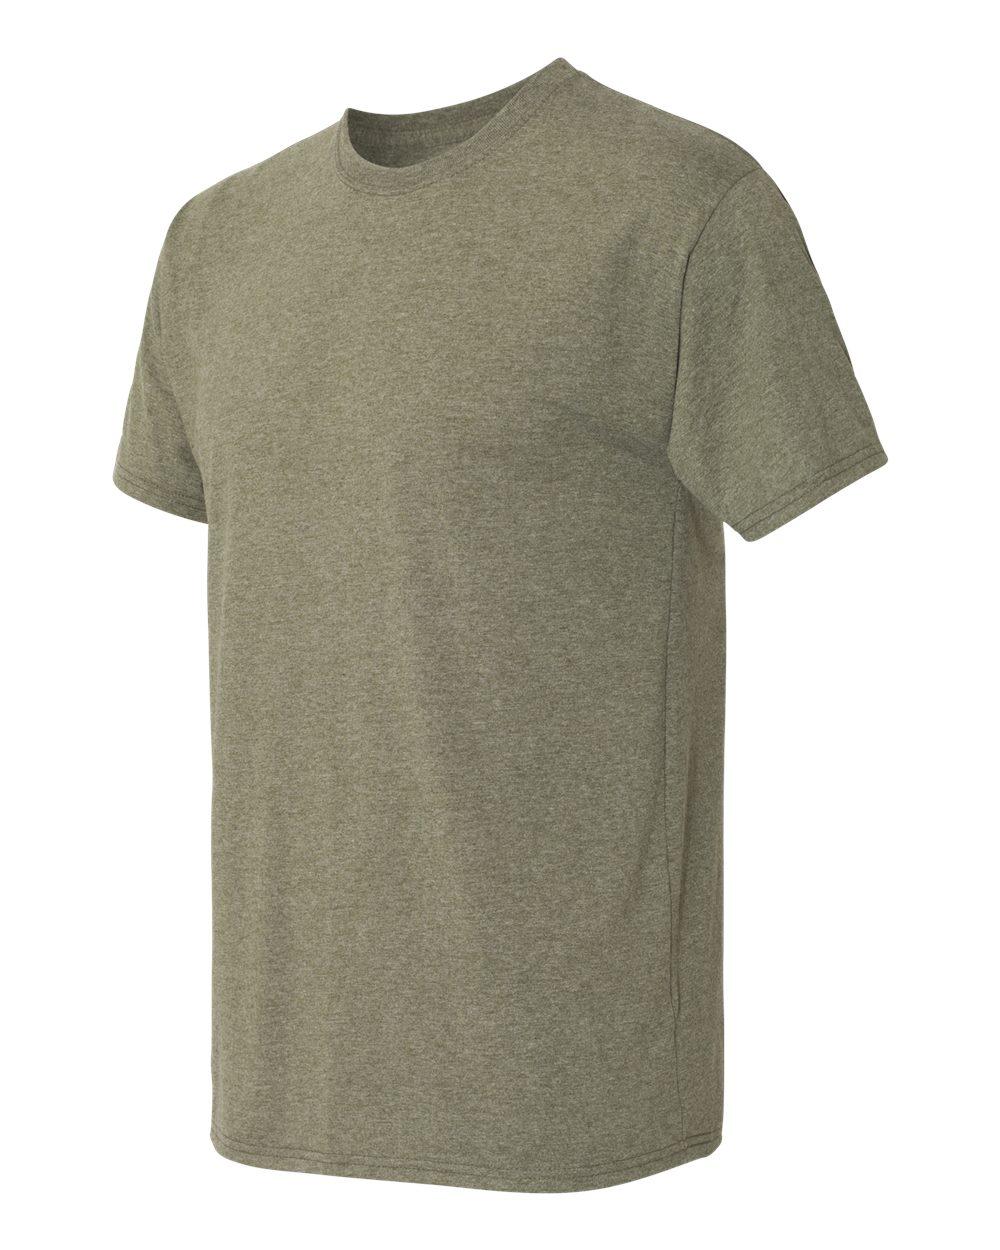 Hanes-Men-039-s-X-Temp-Triblend-T-Shirt-With-Fresh-Iq-42TB-S-3XL thumbnail 17